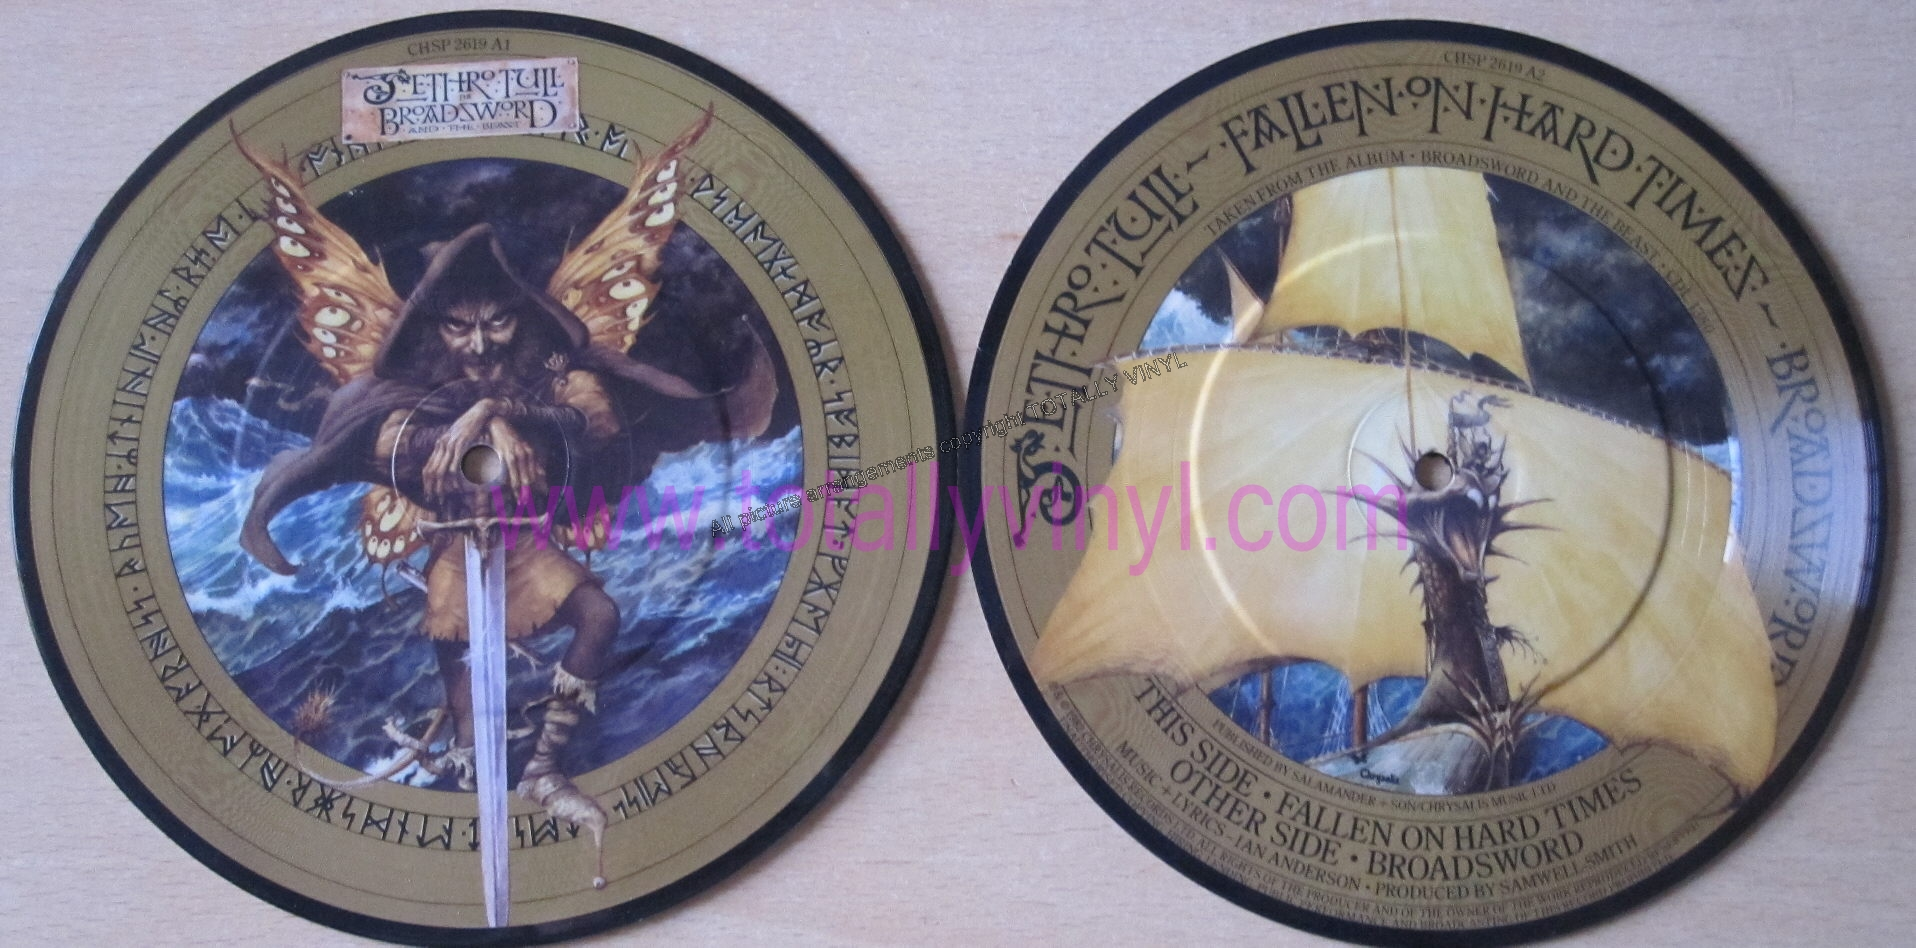 Totally Vinyl Records Jethro Tull Broadsword 7 Inch